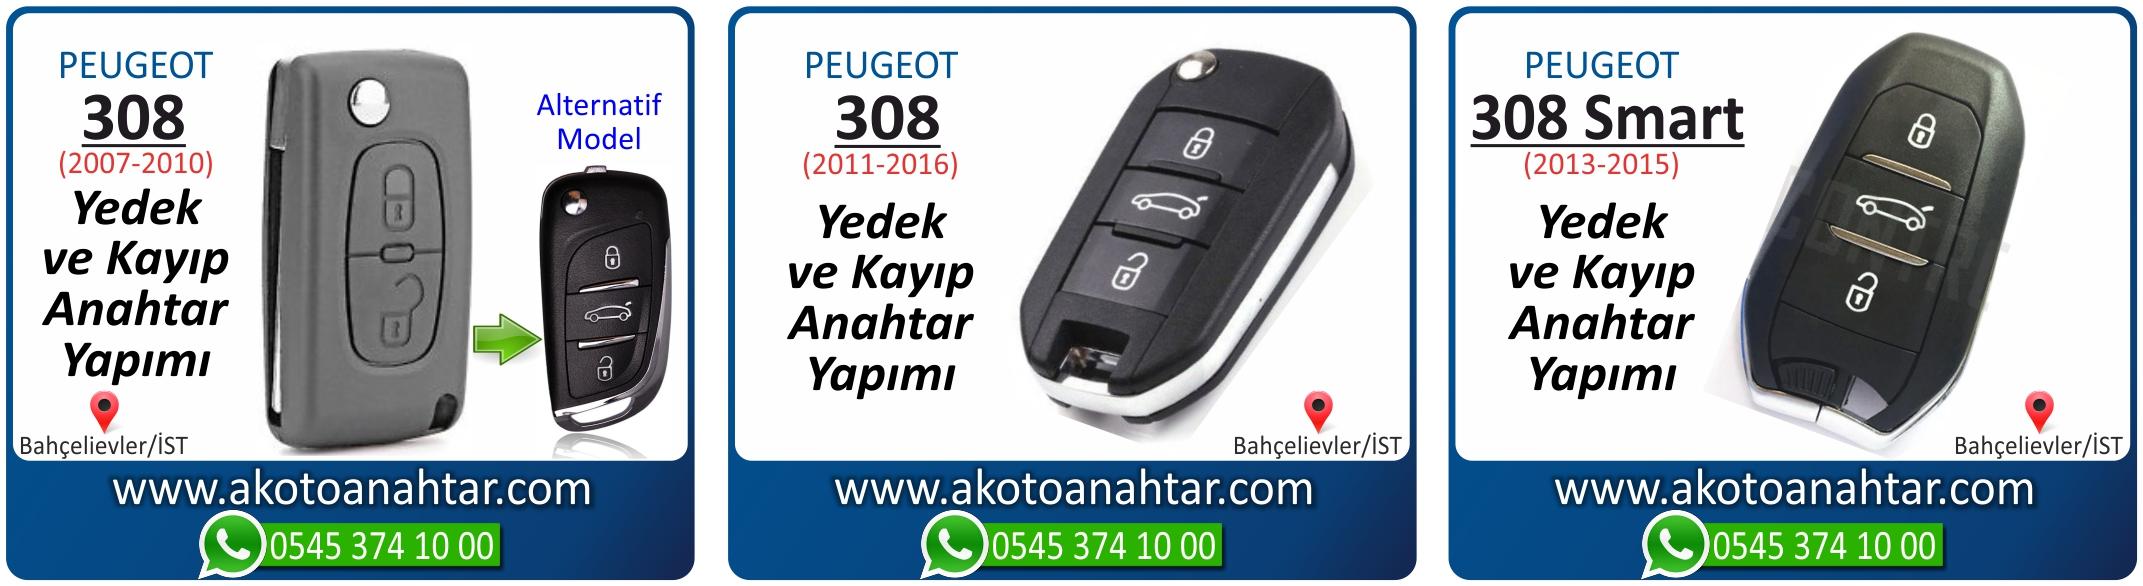 Peugeot 308 anahtari - Peugeot 308 Anahtarı | Yedek ve Kayıp Anahtar Yapımı